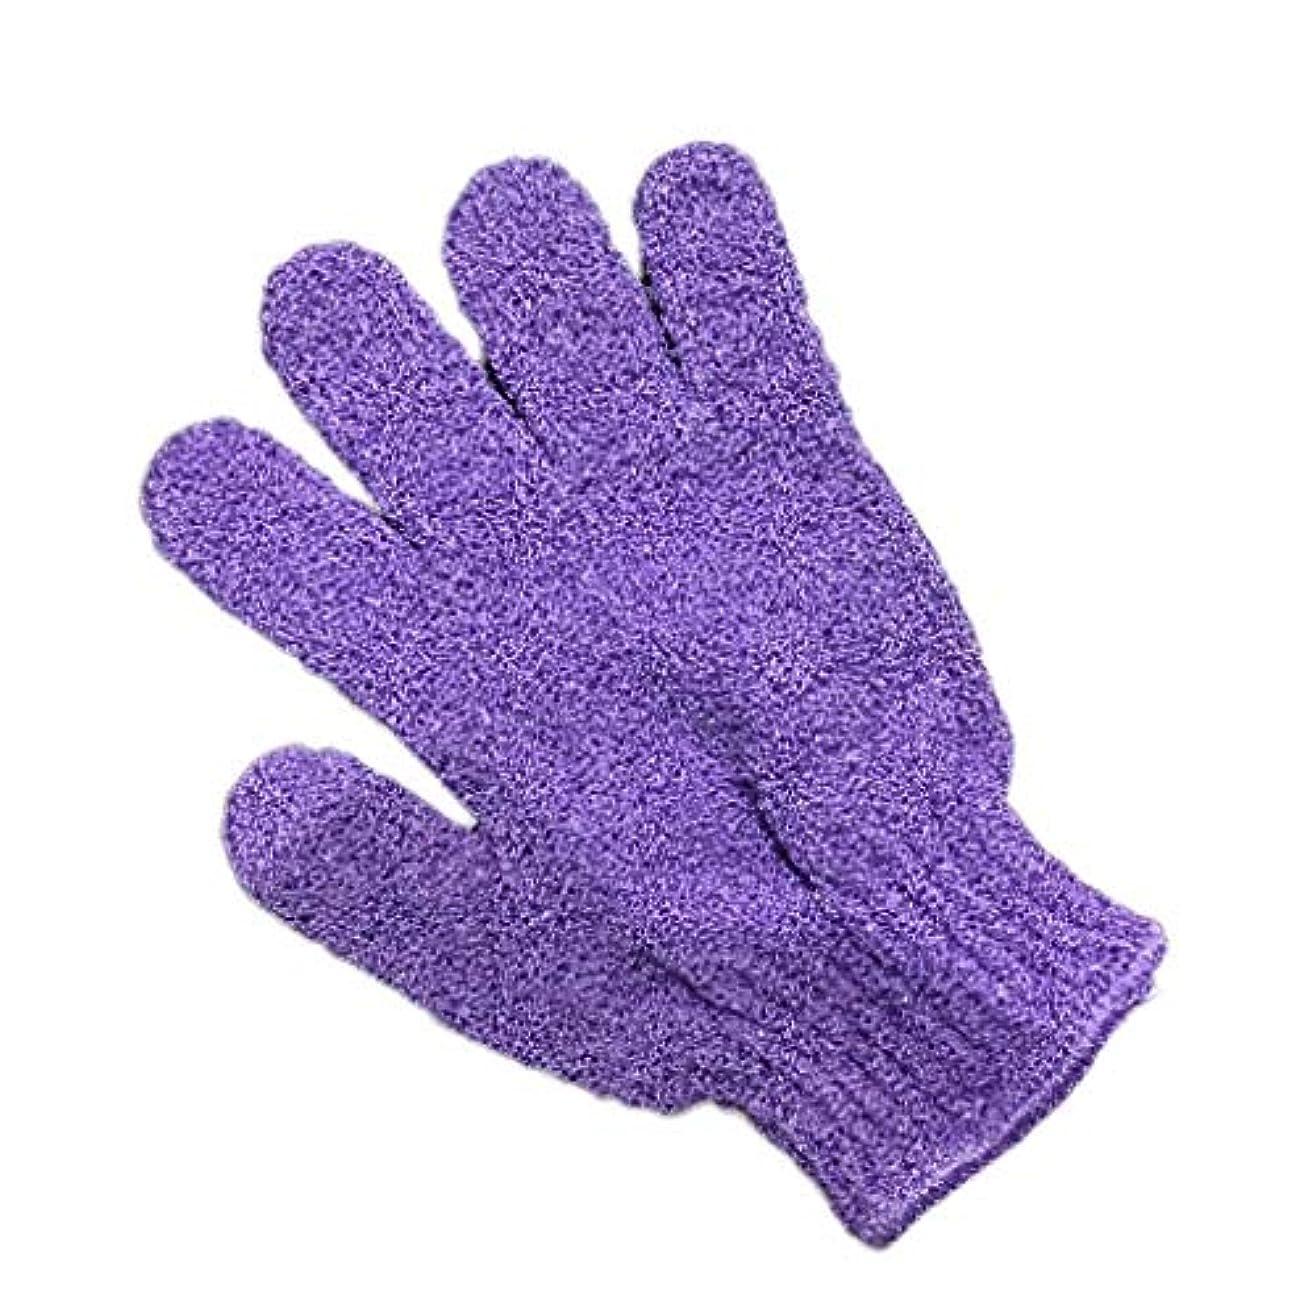 Suika Suika お風呂用手袋 ボディウォッシュ手袋 入浴用品 垢すり用グローブ 抗菌加工 角質除去 泡立ち 男女兼用 便利なループ付け